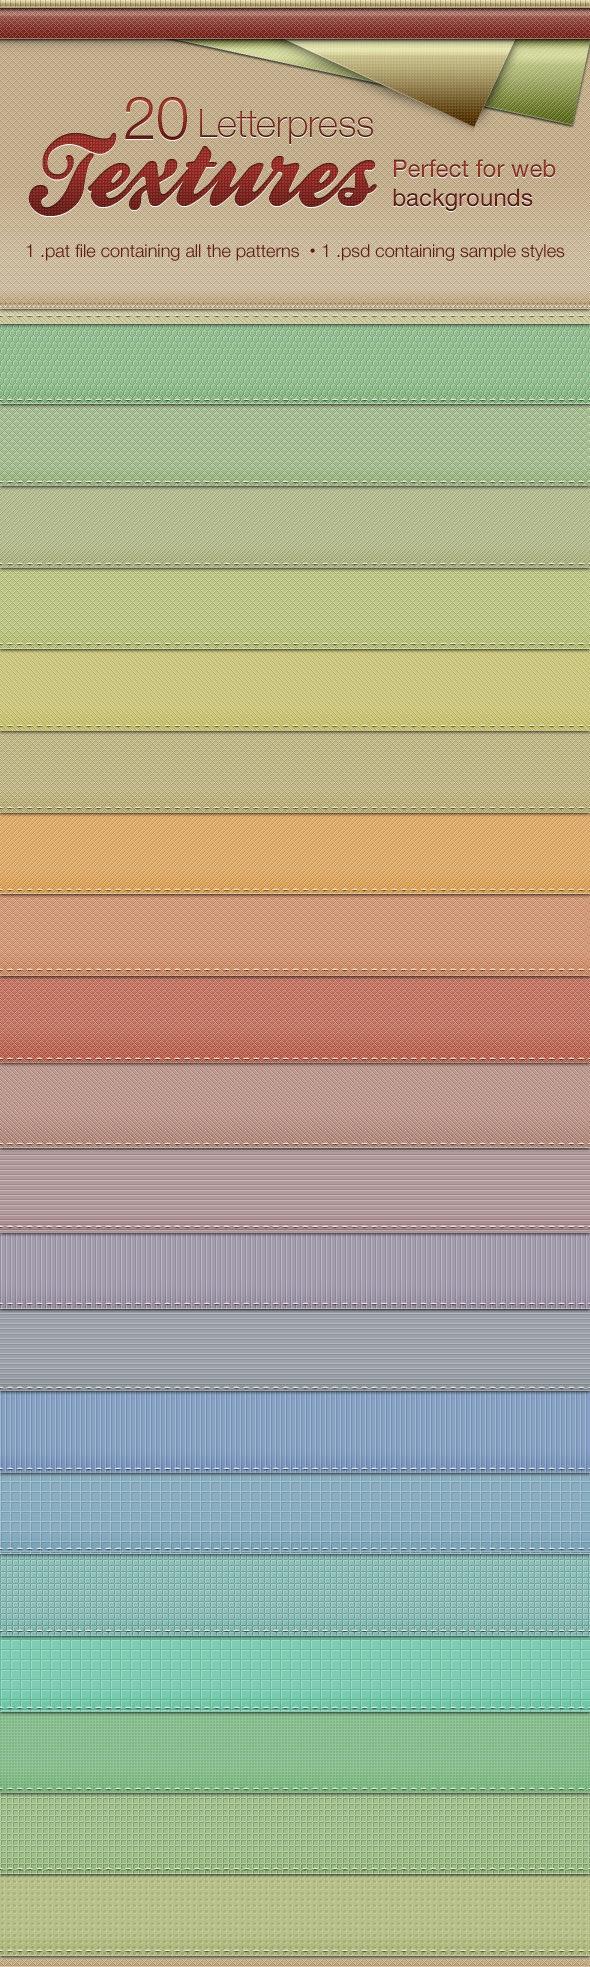 Letterpress Texture Patterns - Textures / Fills / Patterns Photoshop